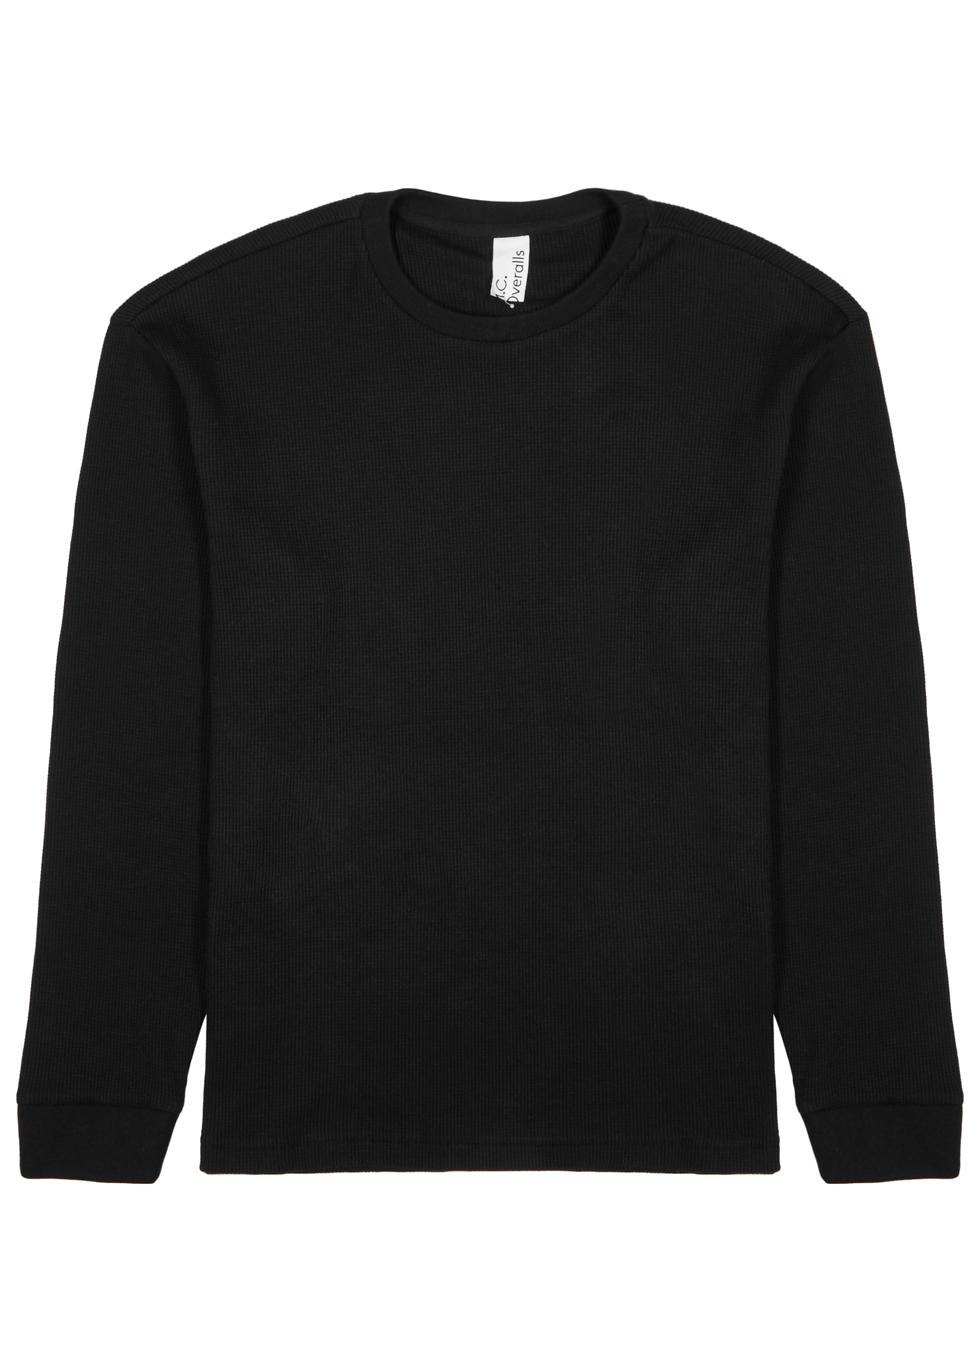 M.C. OVERALLS Black Waffle-Knit Cotton-Blend Top